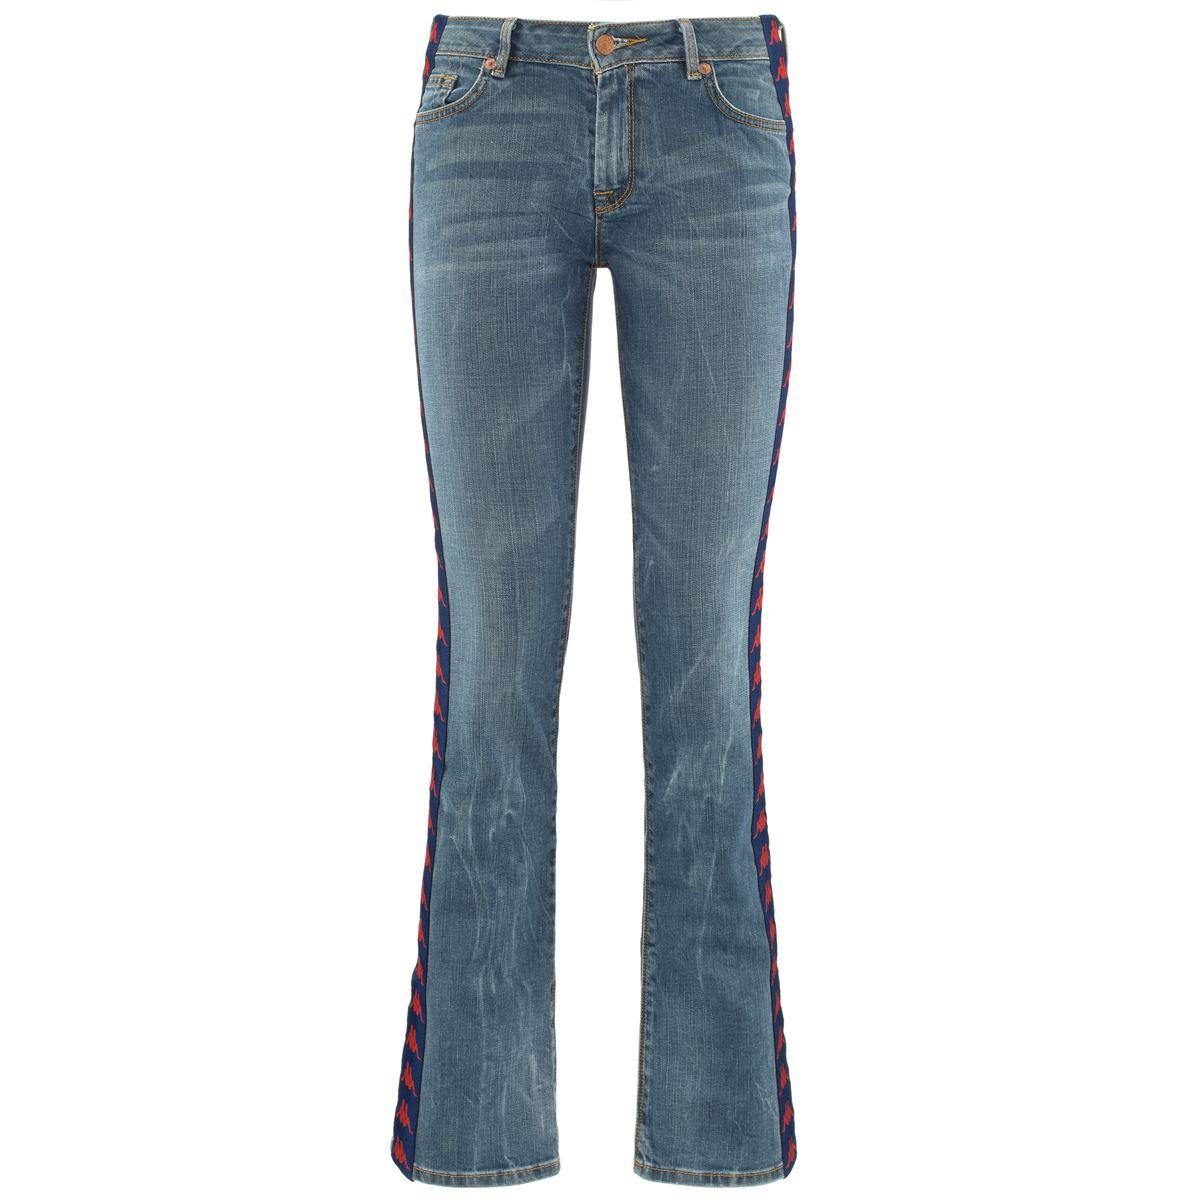 Jesus Jeans Pants Woman 832 SWT Denim 5 Pockets